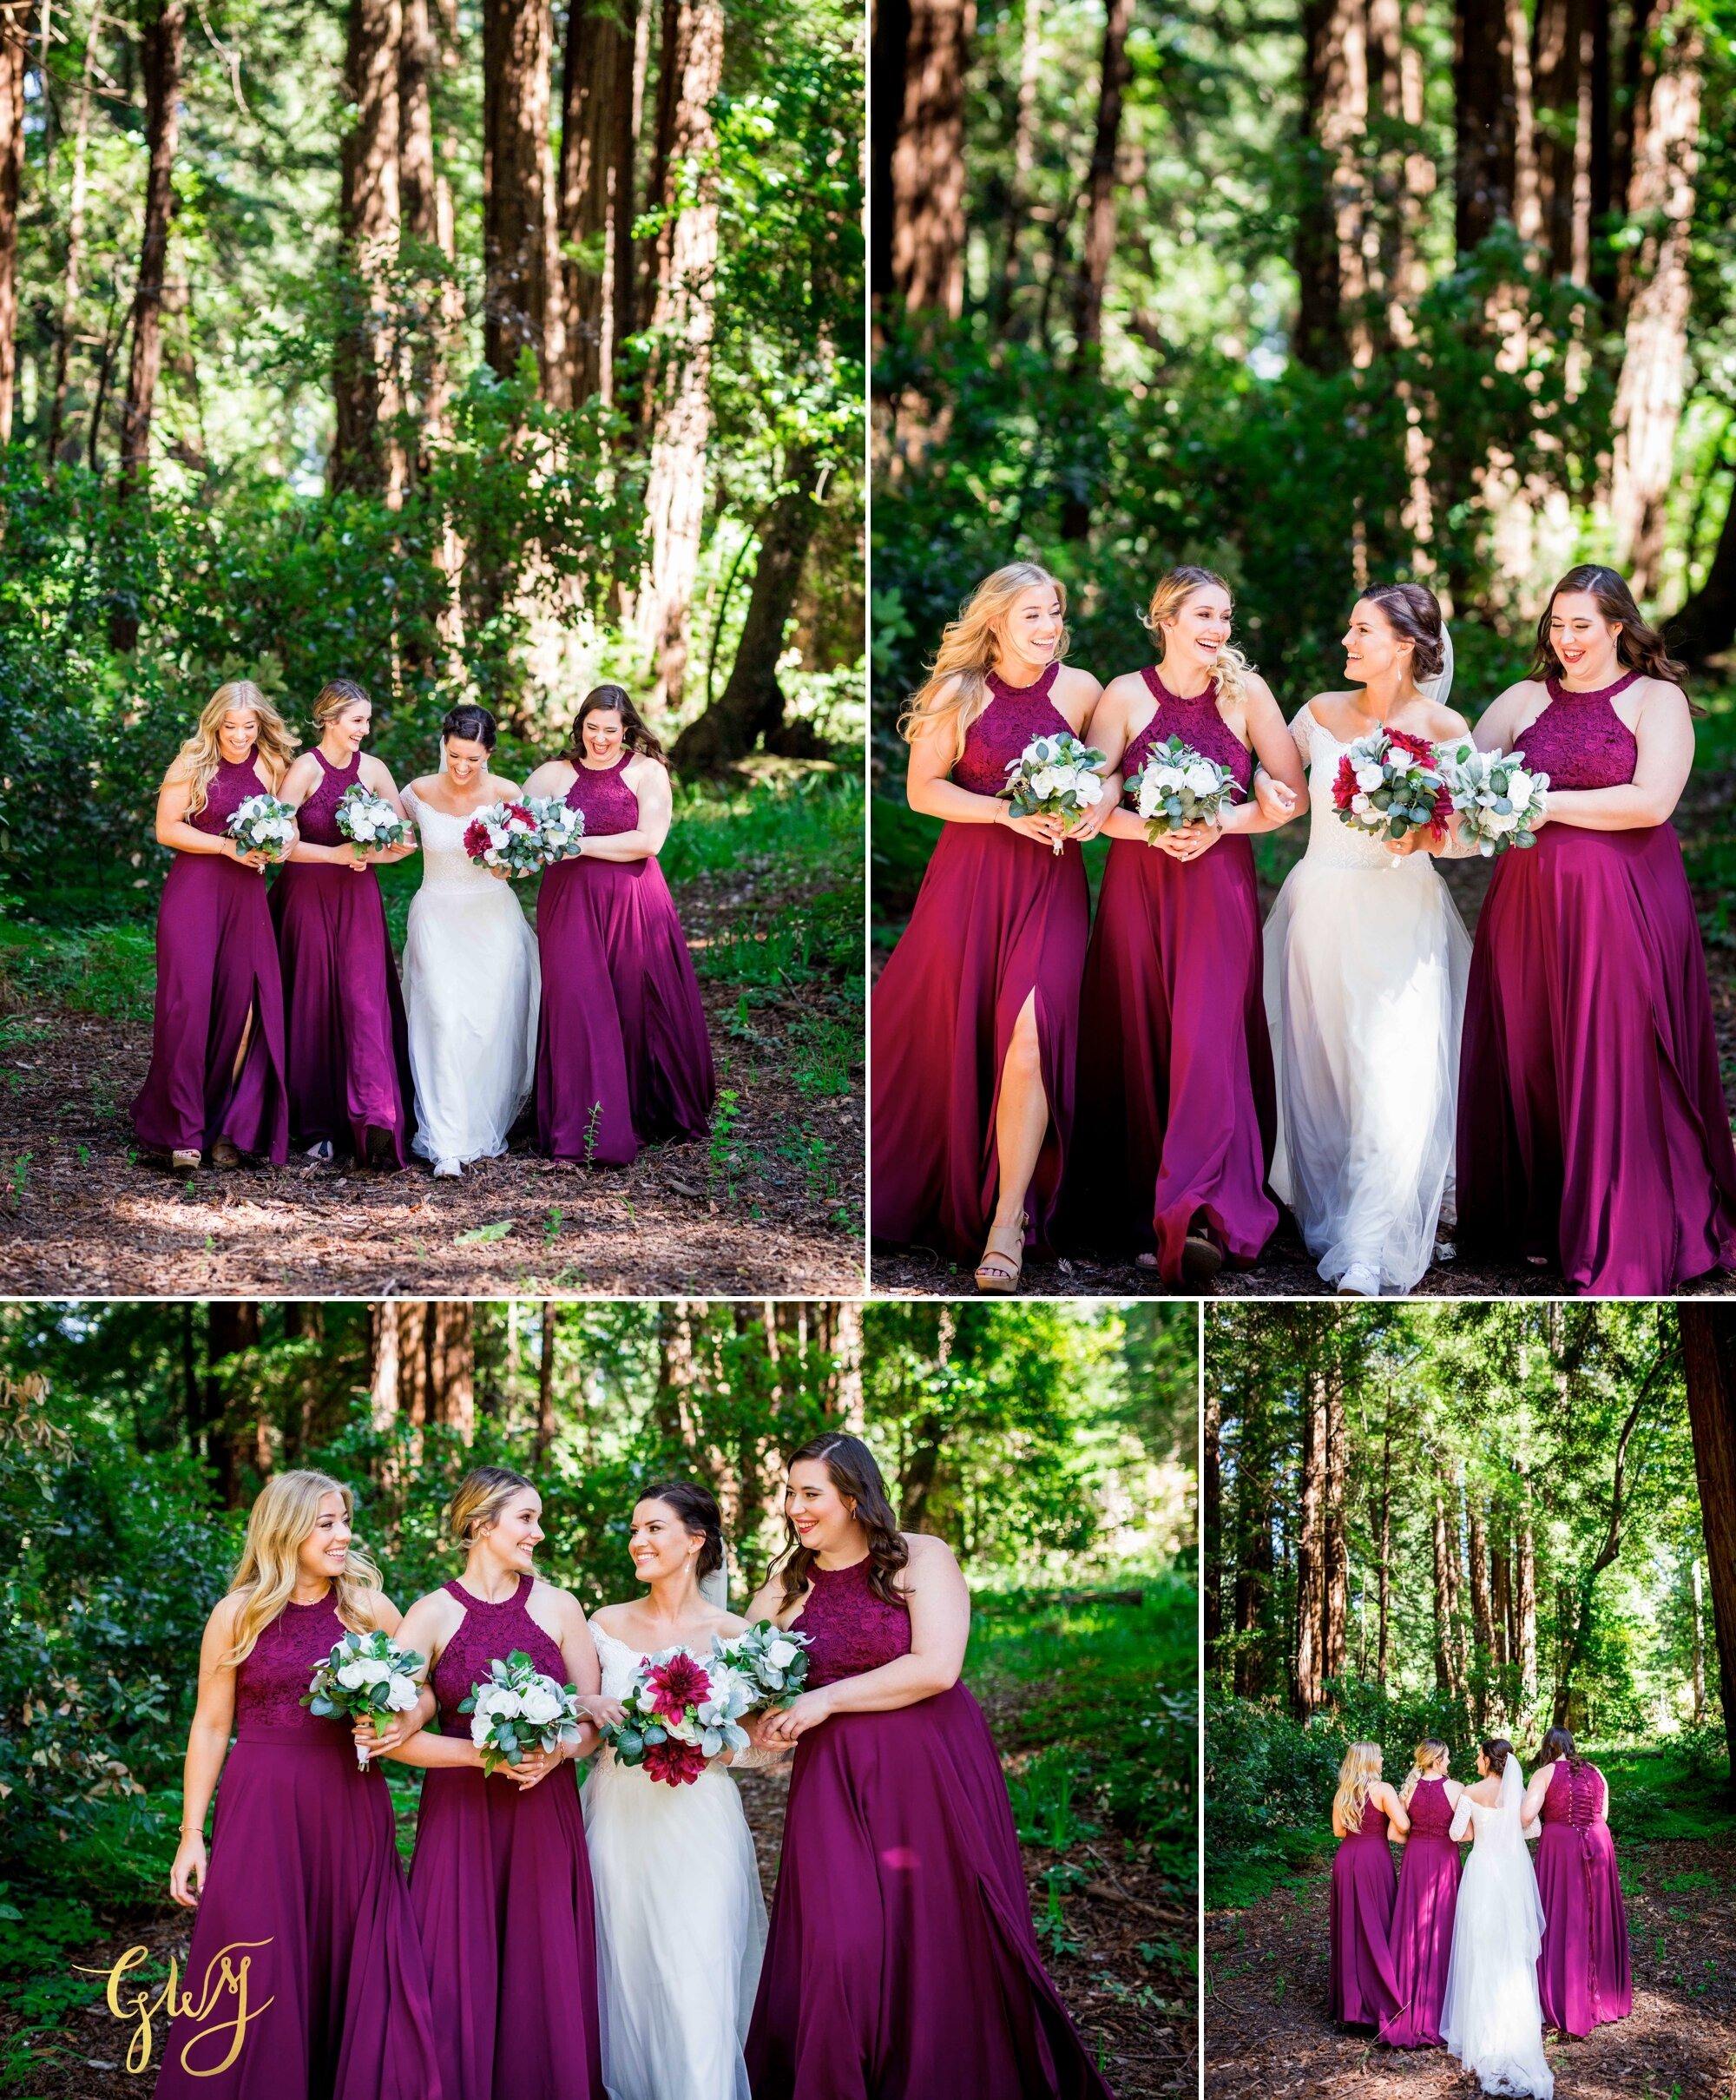 Casey + Jordan's Intimate Big Sur Elopement in the Redwoods by Glass Woods Media 23.jpg